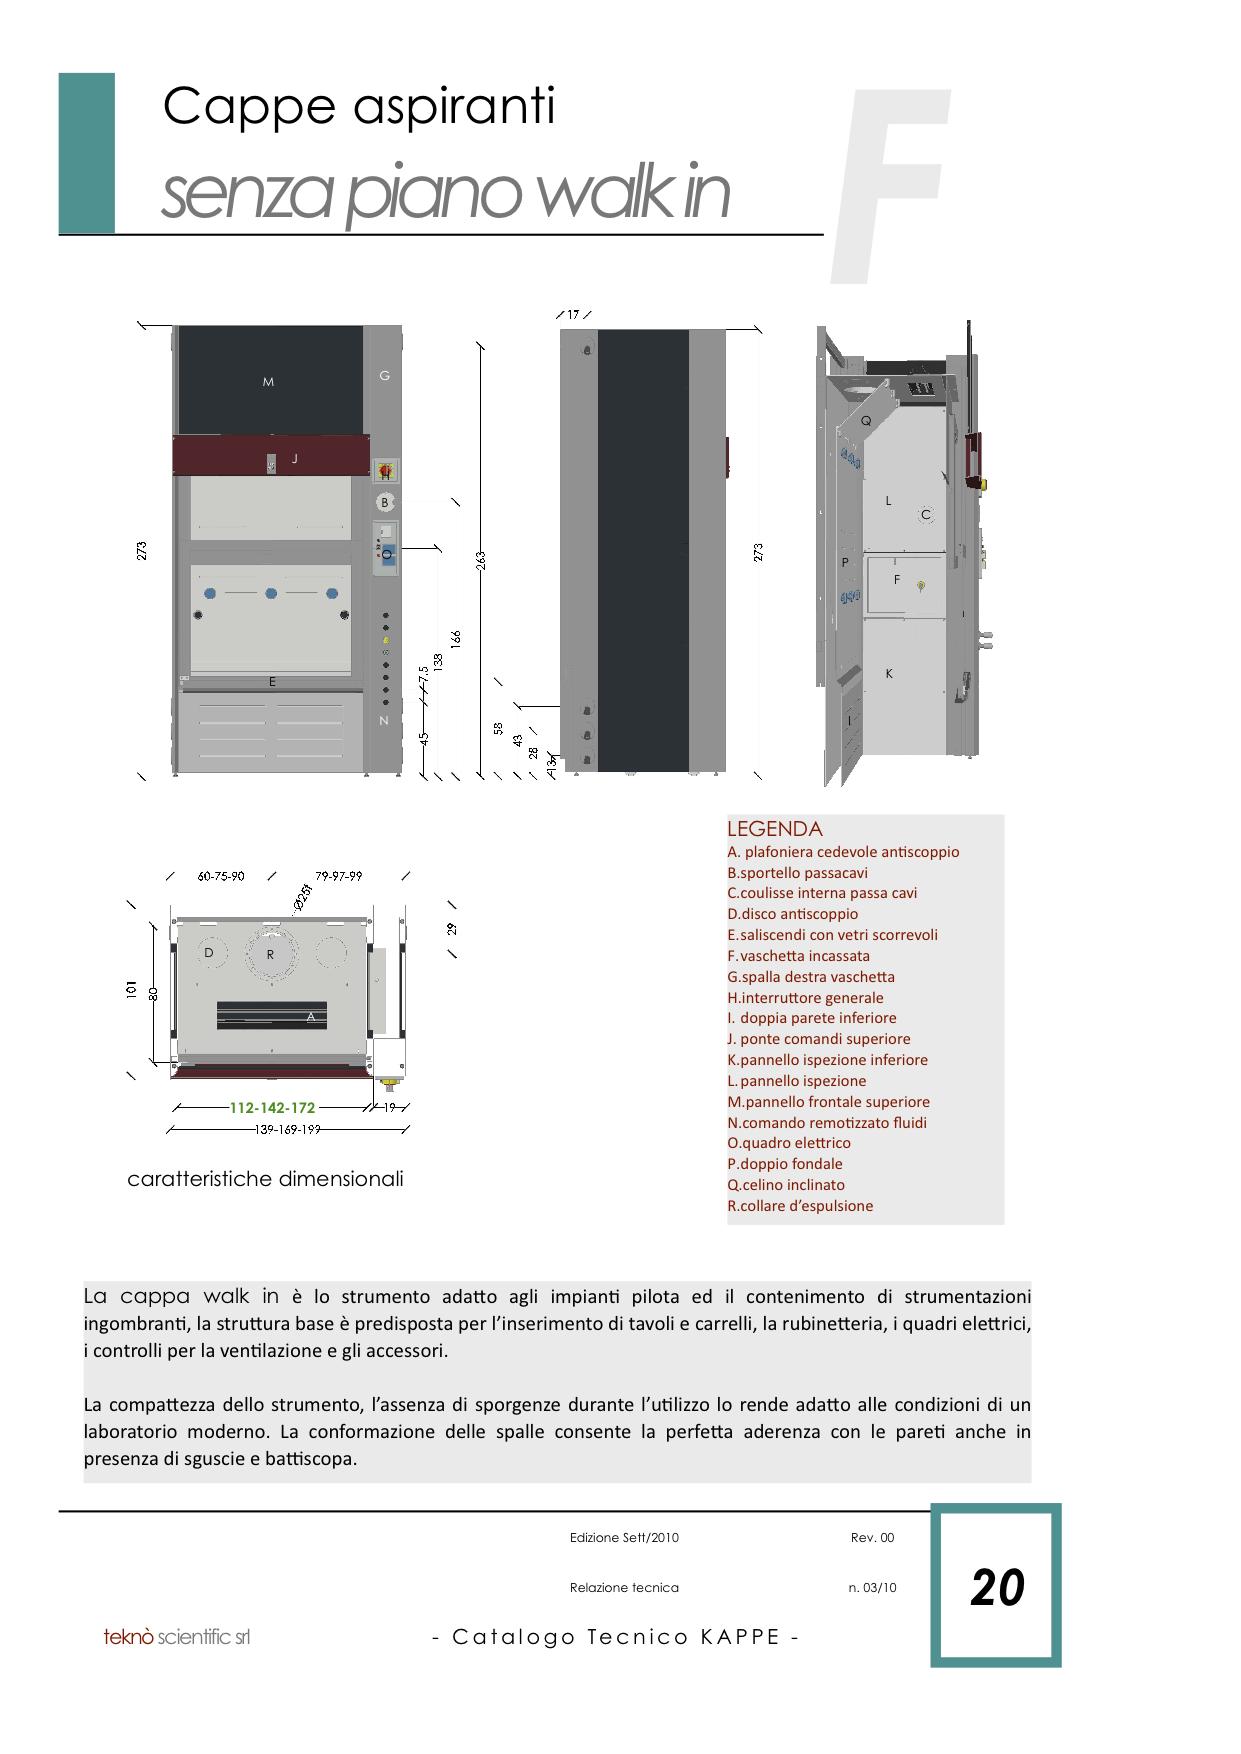 KAPPE Catalogo Tecnico Generale copia 19.png